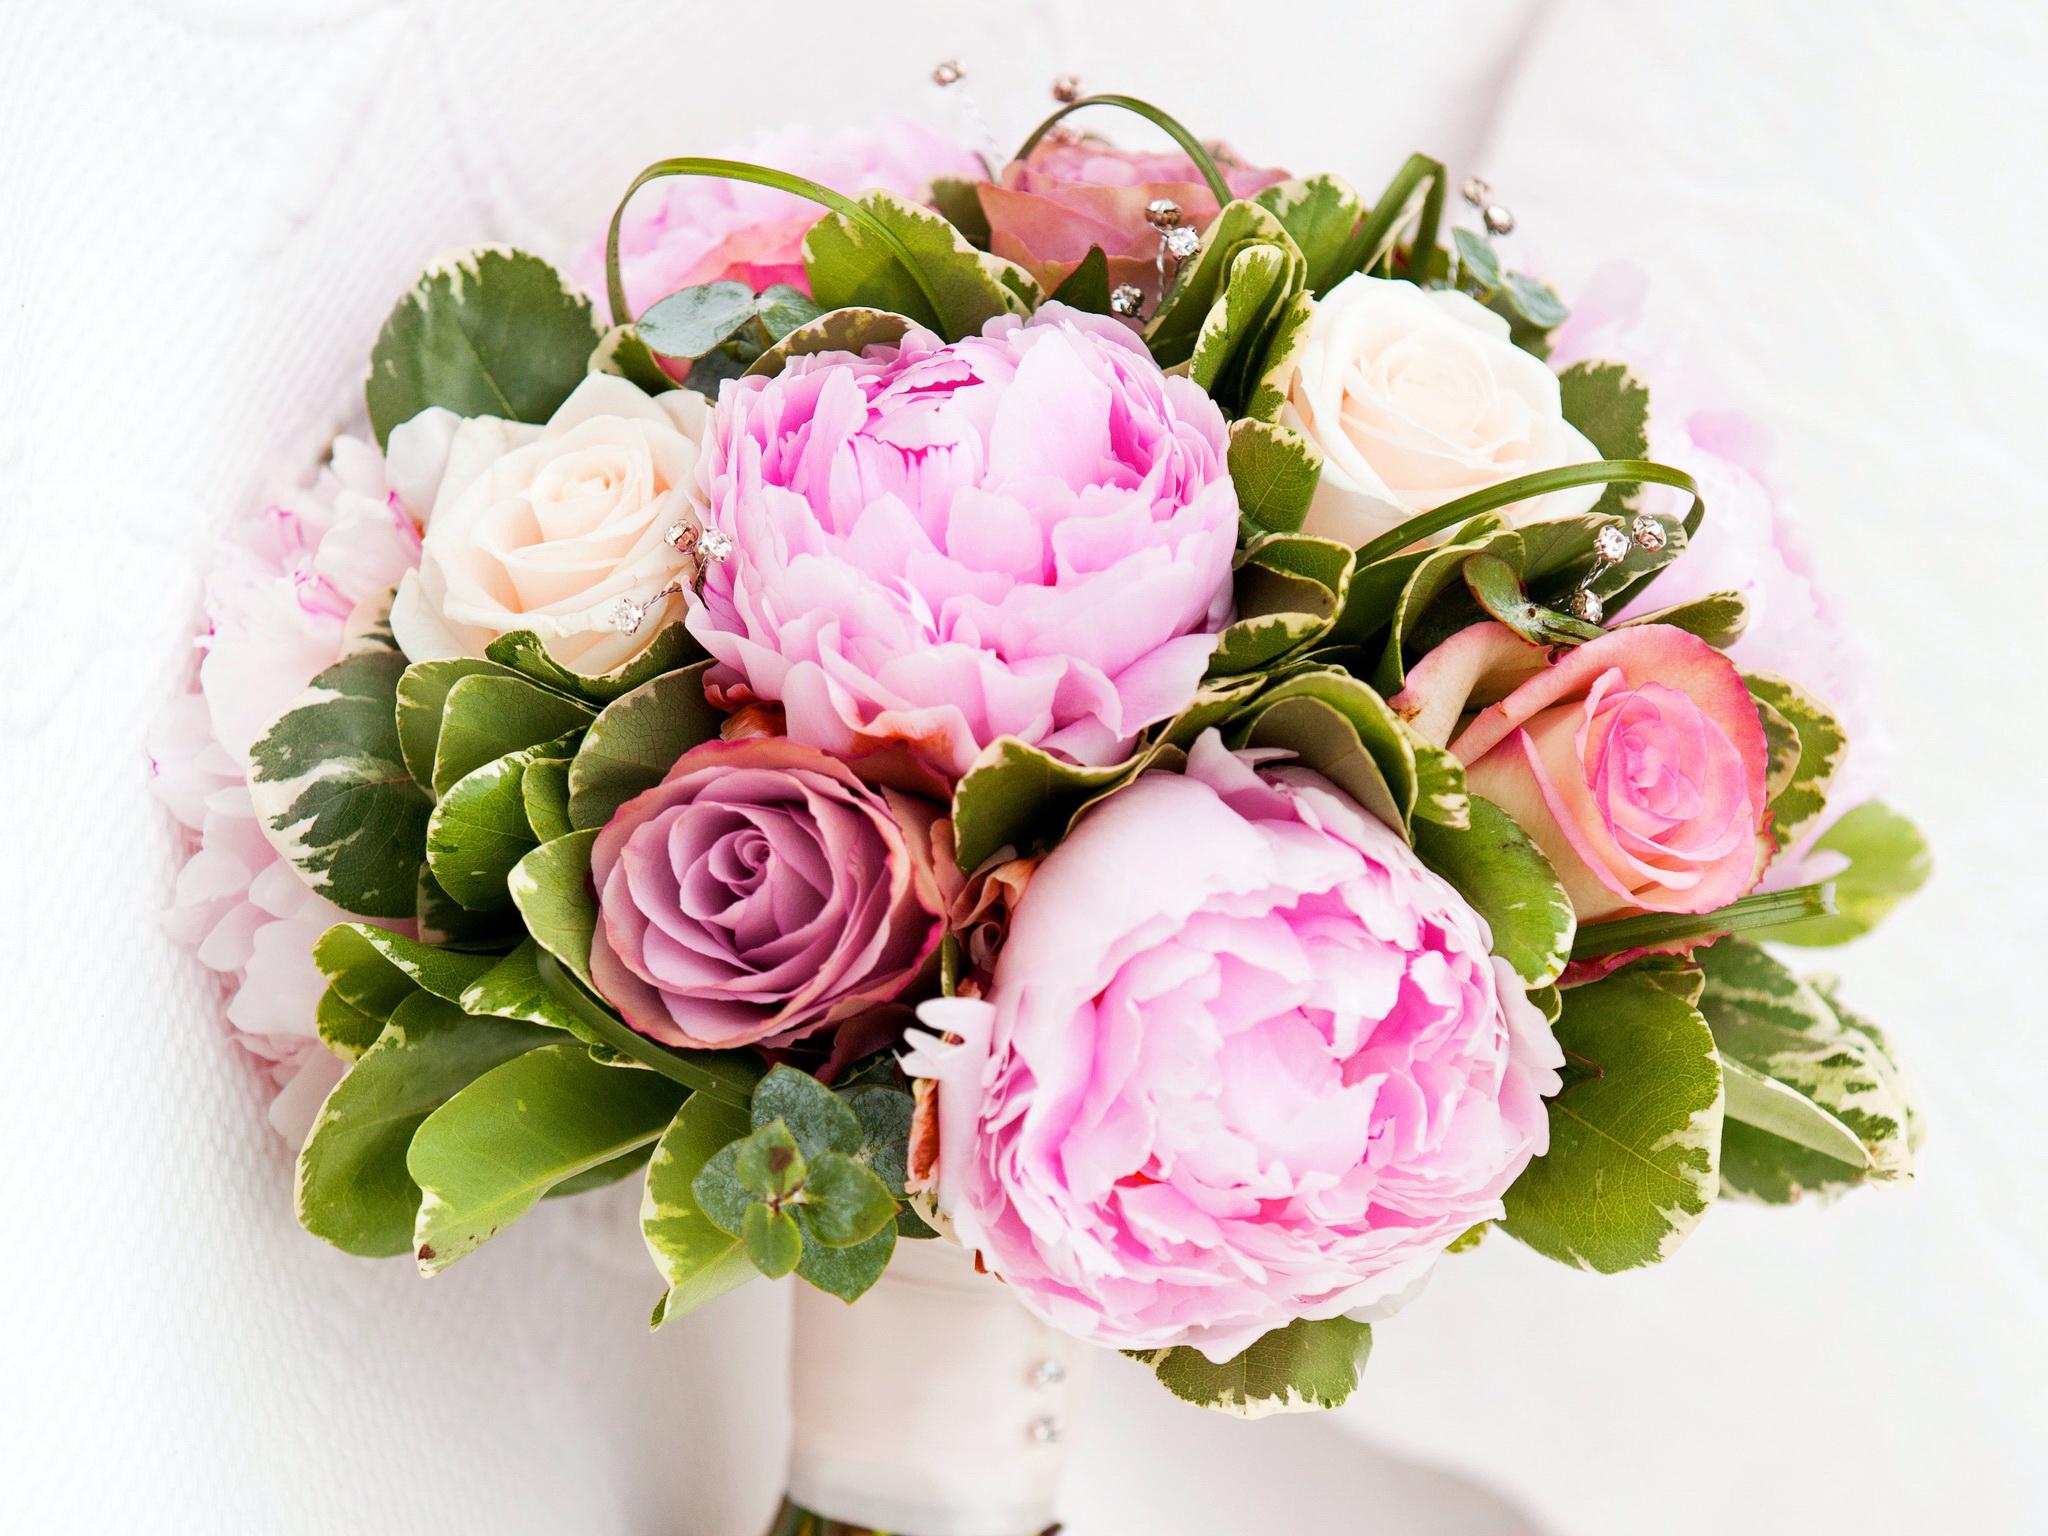 3d Hd Wallpapers Flowers Rose 15 Wonderful Hd Flower Bouquet Wallpapers